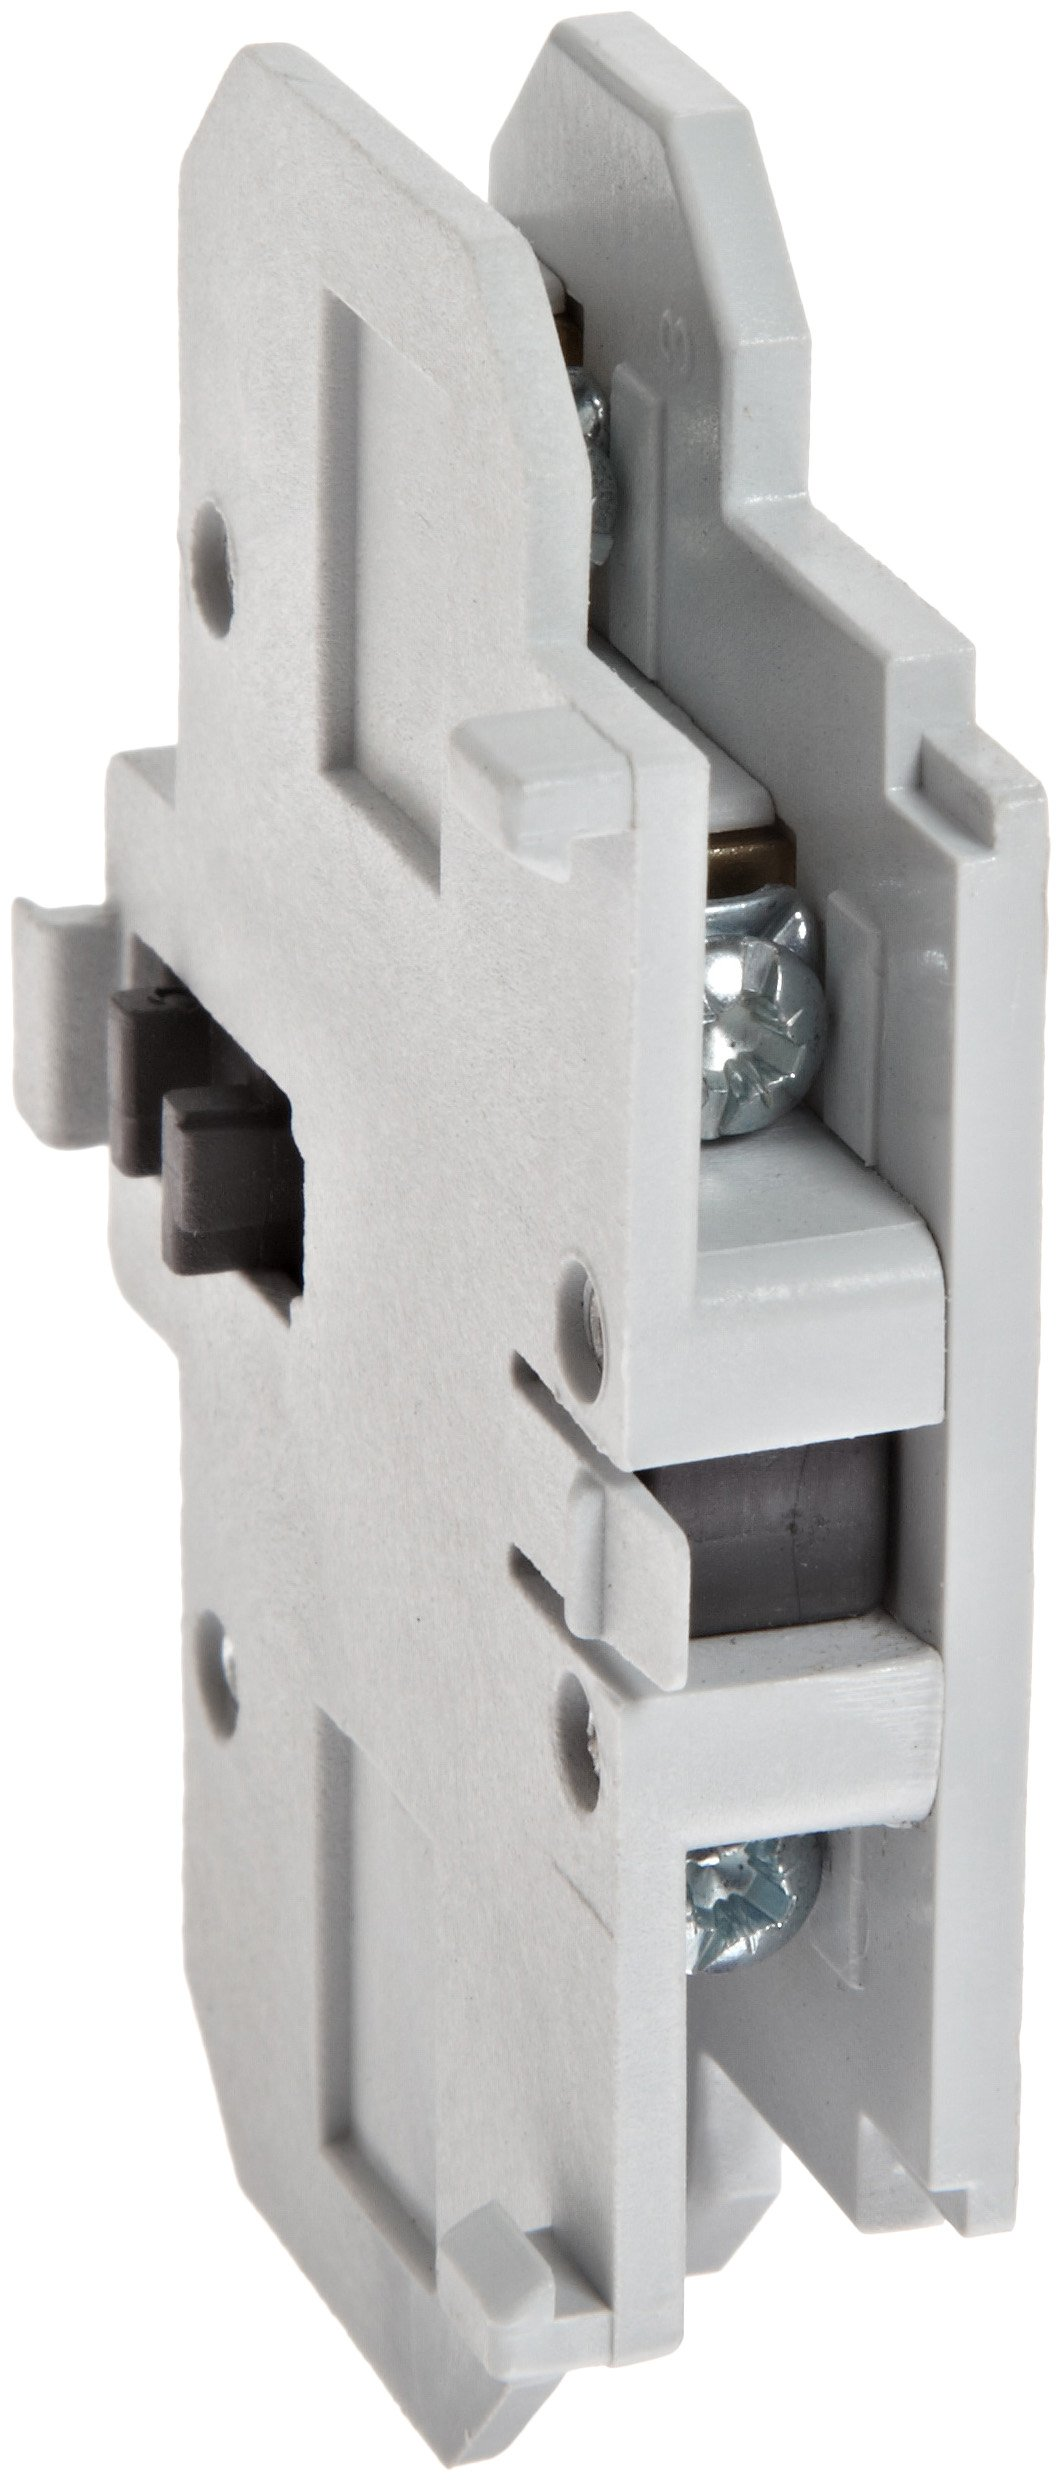 Eaton C320KGS3 Nema Auxiliary Contact For Nema Starters, Side Mount, 1 NO + 1 NC Contacts